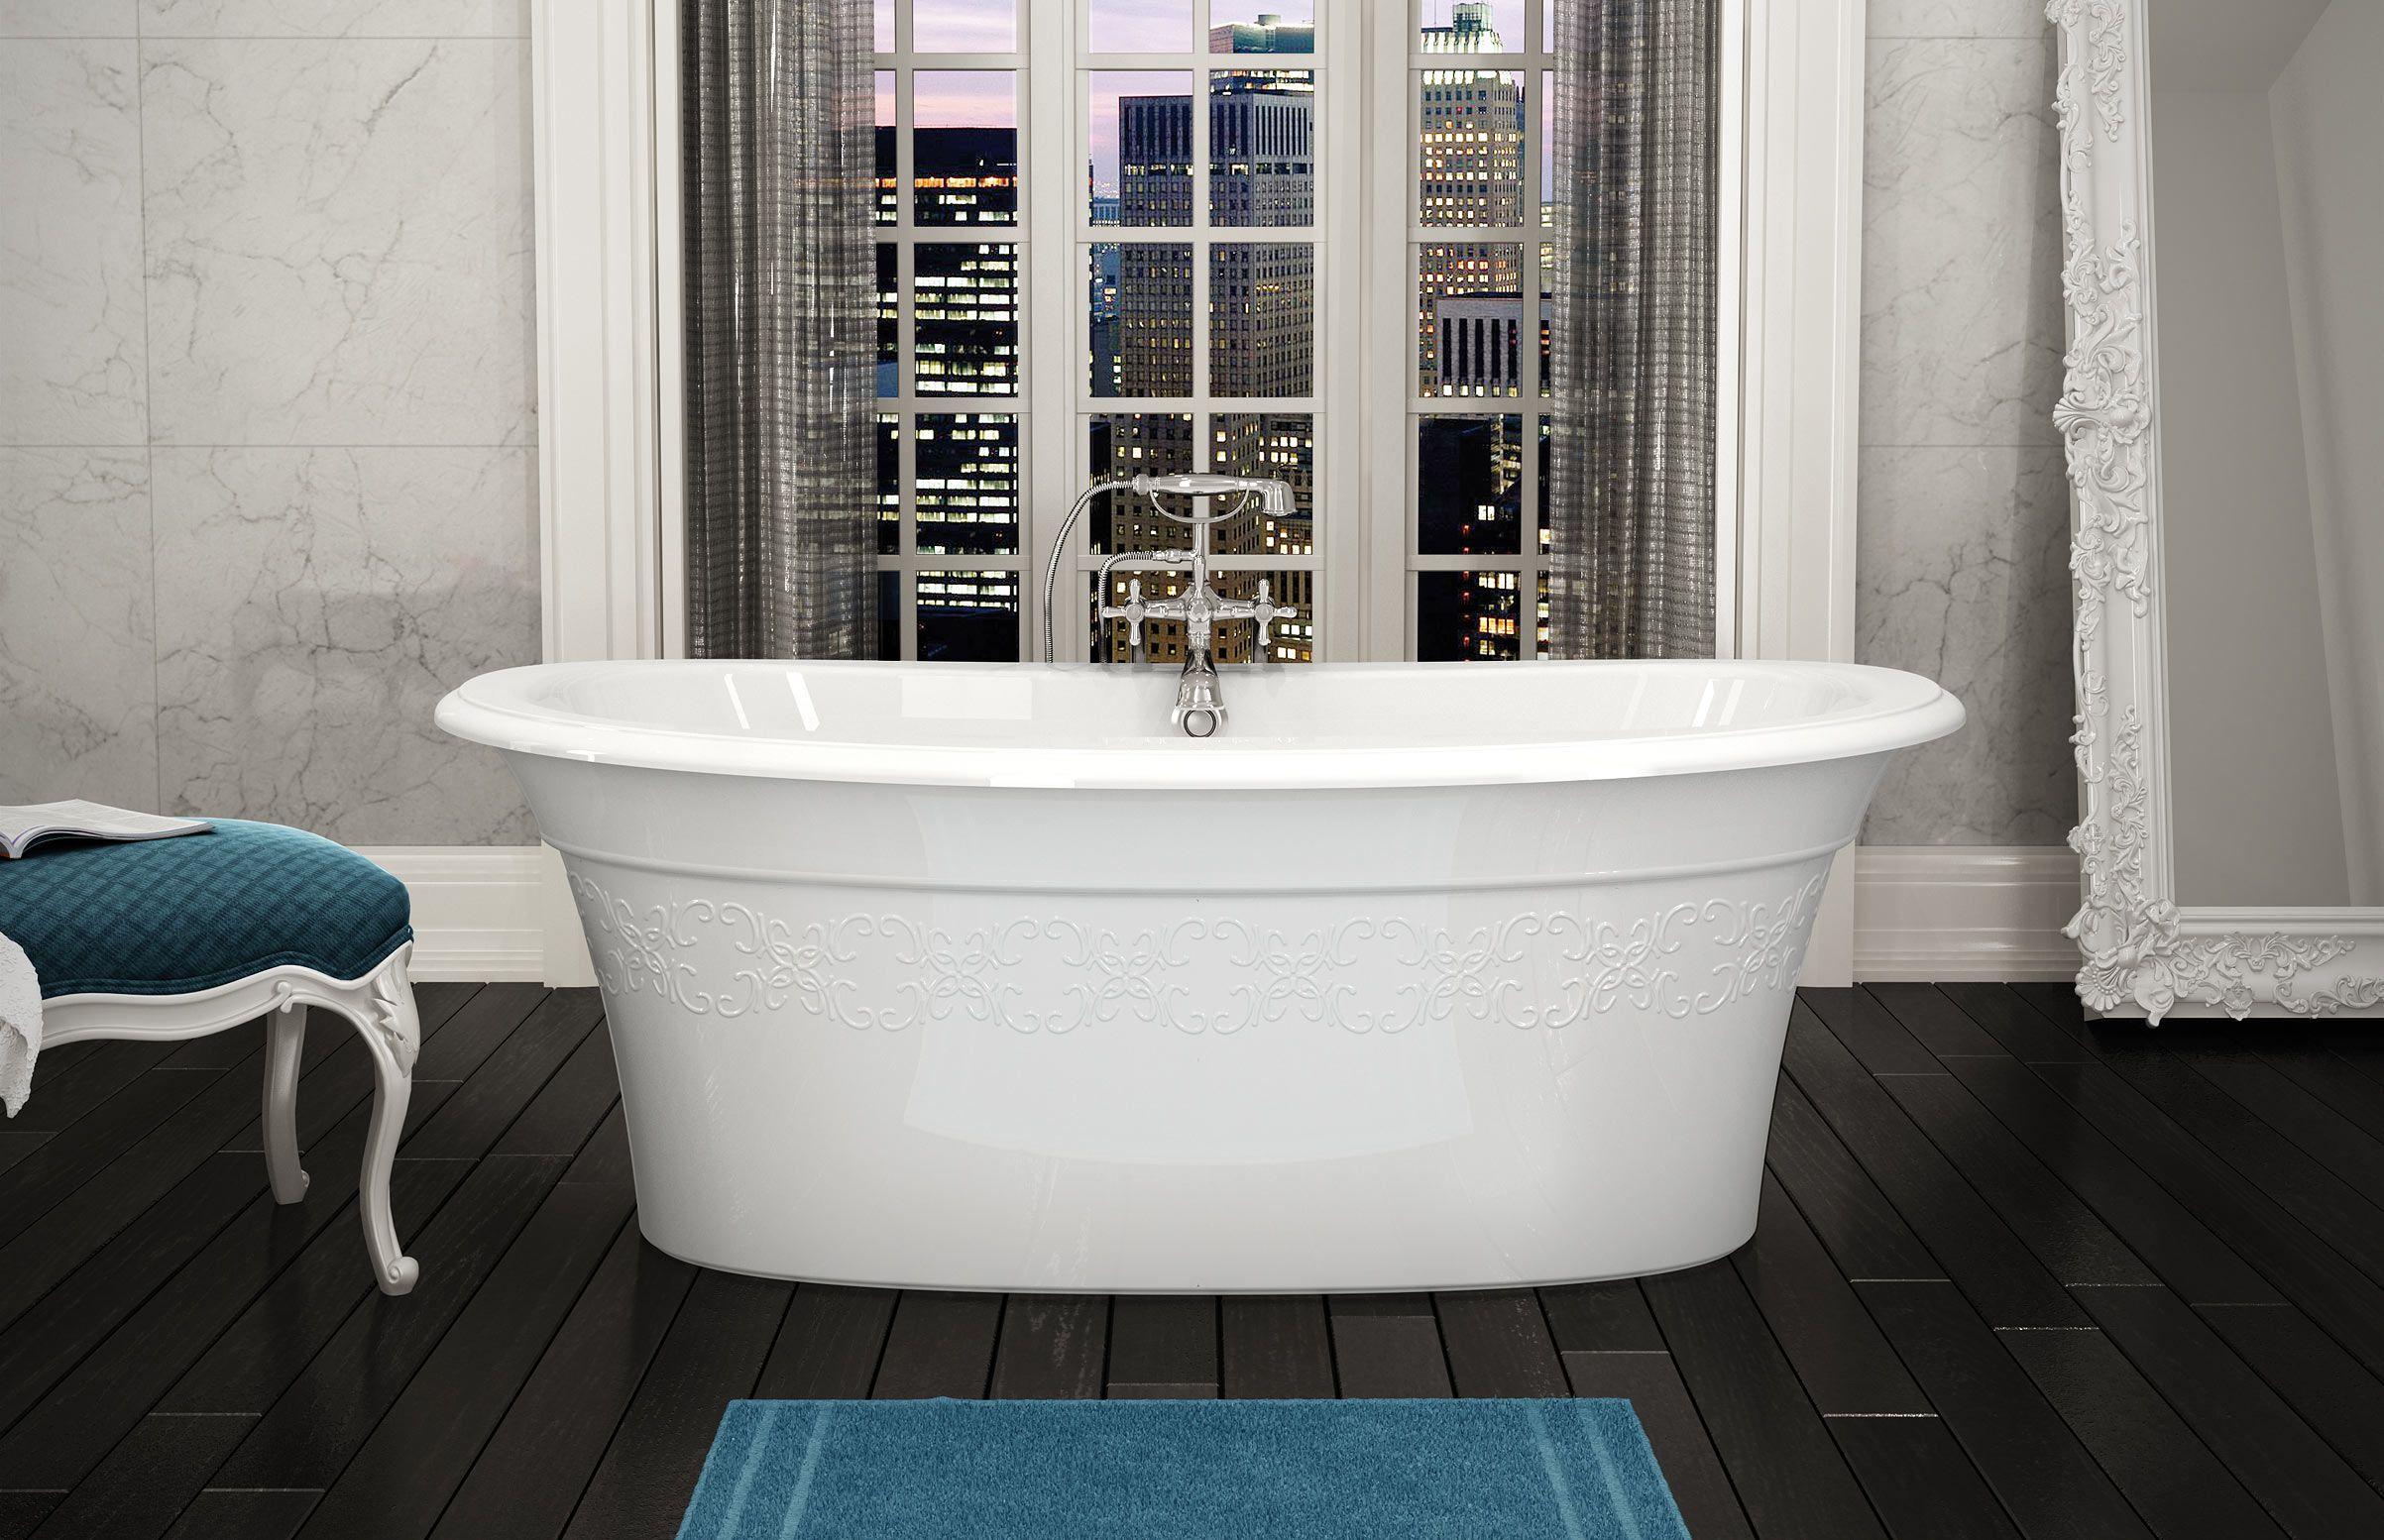 MAAX   Ella Embossed Freestanding Bathtub Www.maax.com